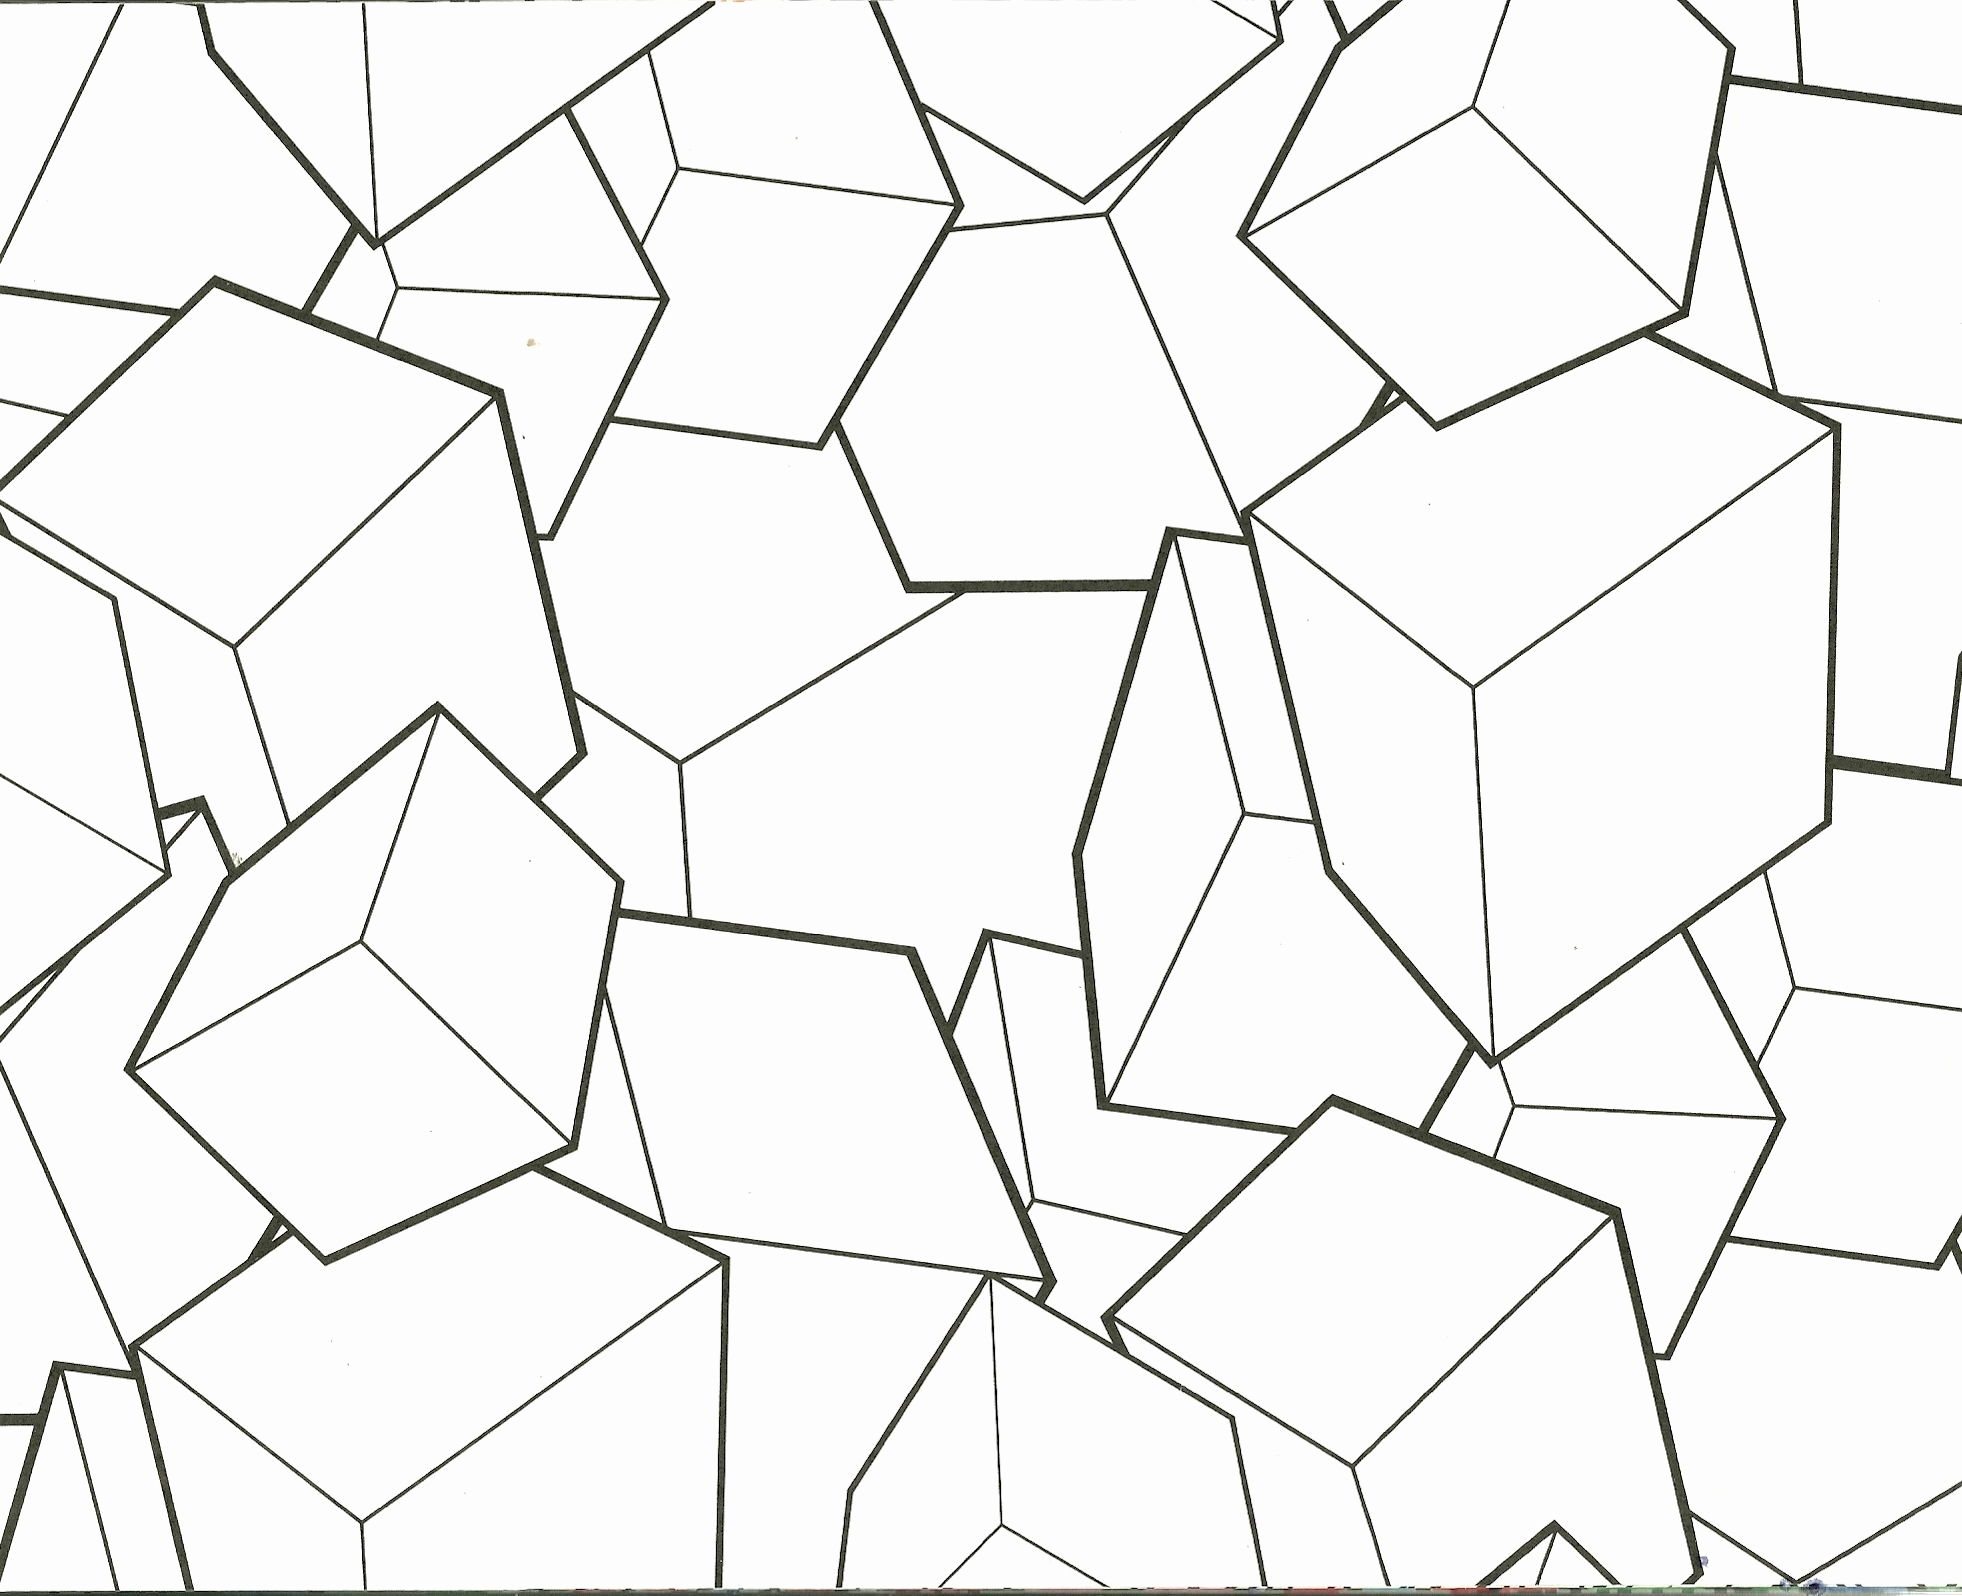 1962x1596 Cactus Coloring Page Elegant Geometric Blocks Design Coloring